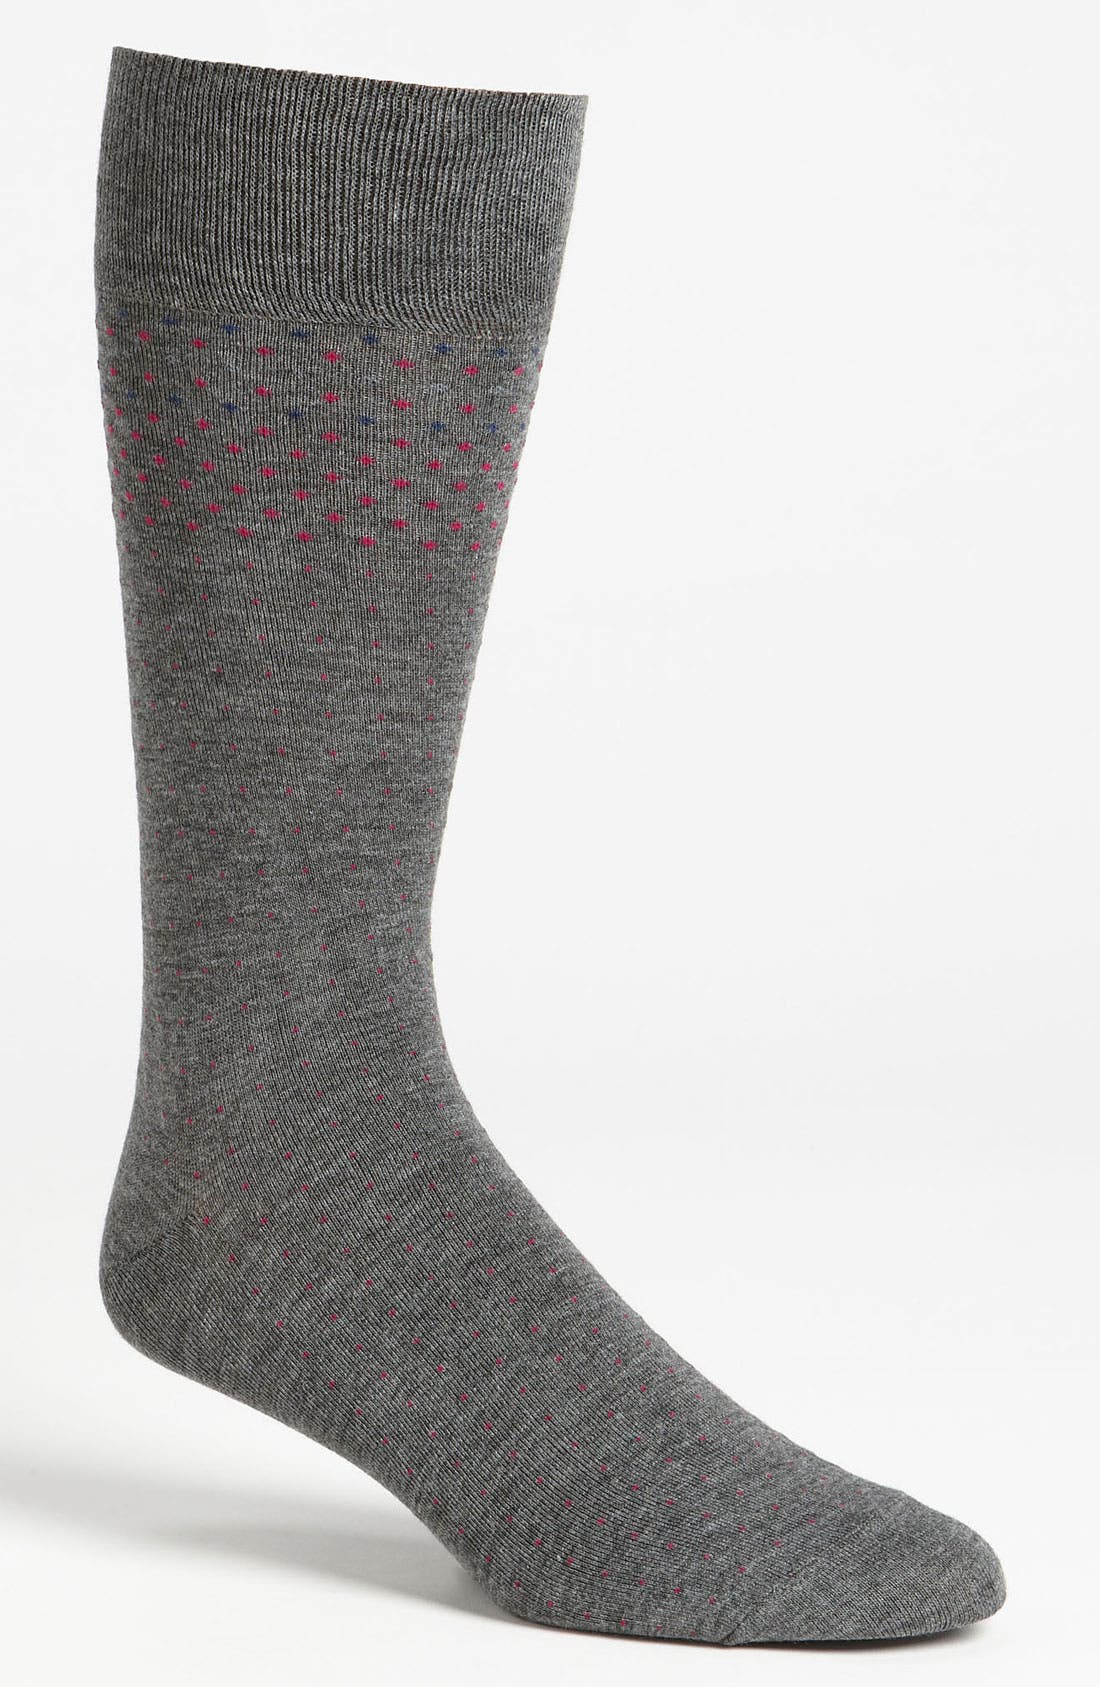 Main Image - Vince Camuto 'Graduated Pin Dot' Socks